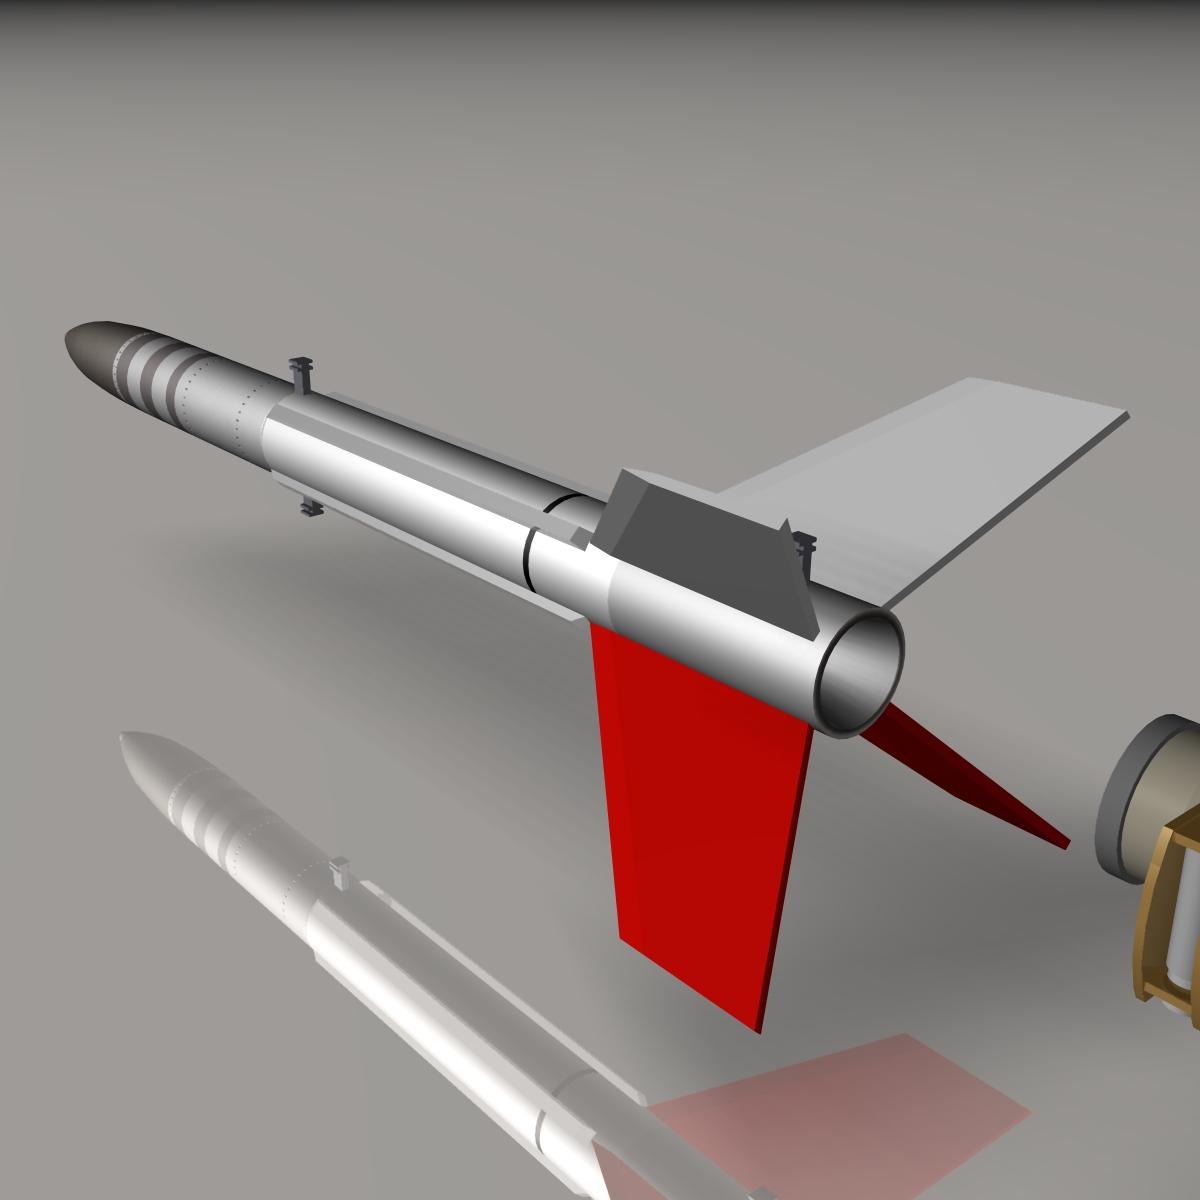 us terrier-lynx rocket 3d model 3ds dxf cob x obj 140325